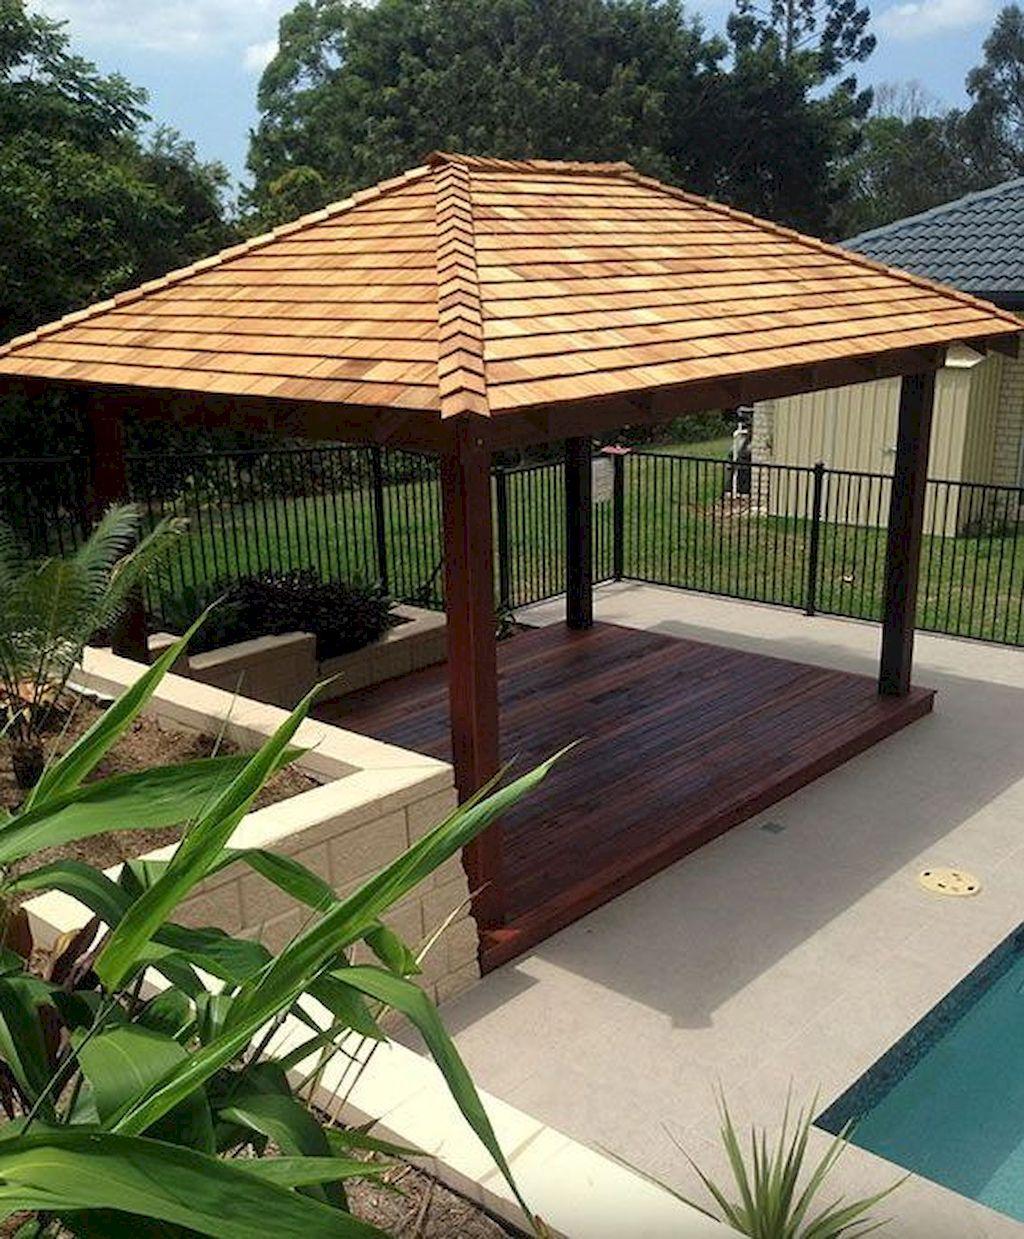 70 Diy Backyard Gazebo Design And Decorating Ideas En 2020 Pergola Couverte Pergola Bioclimatique Auvent De Patio